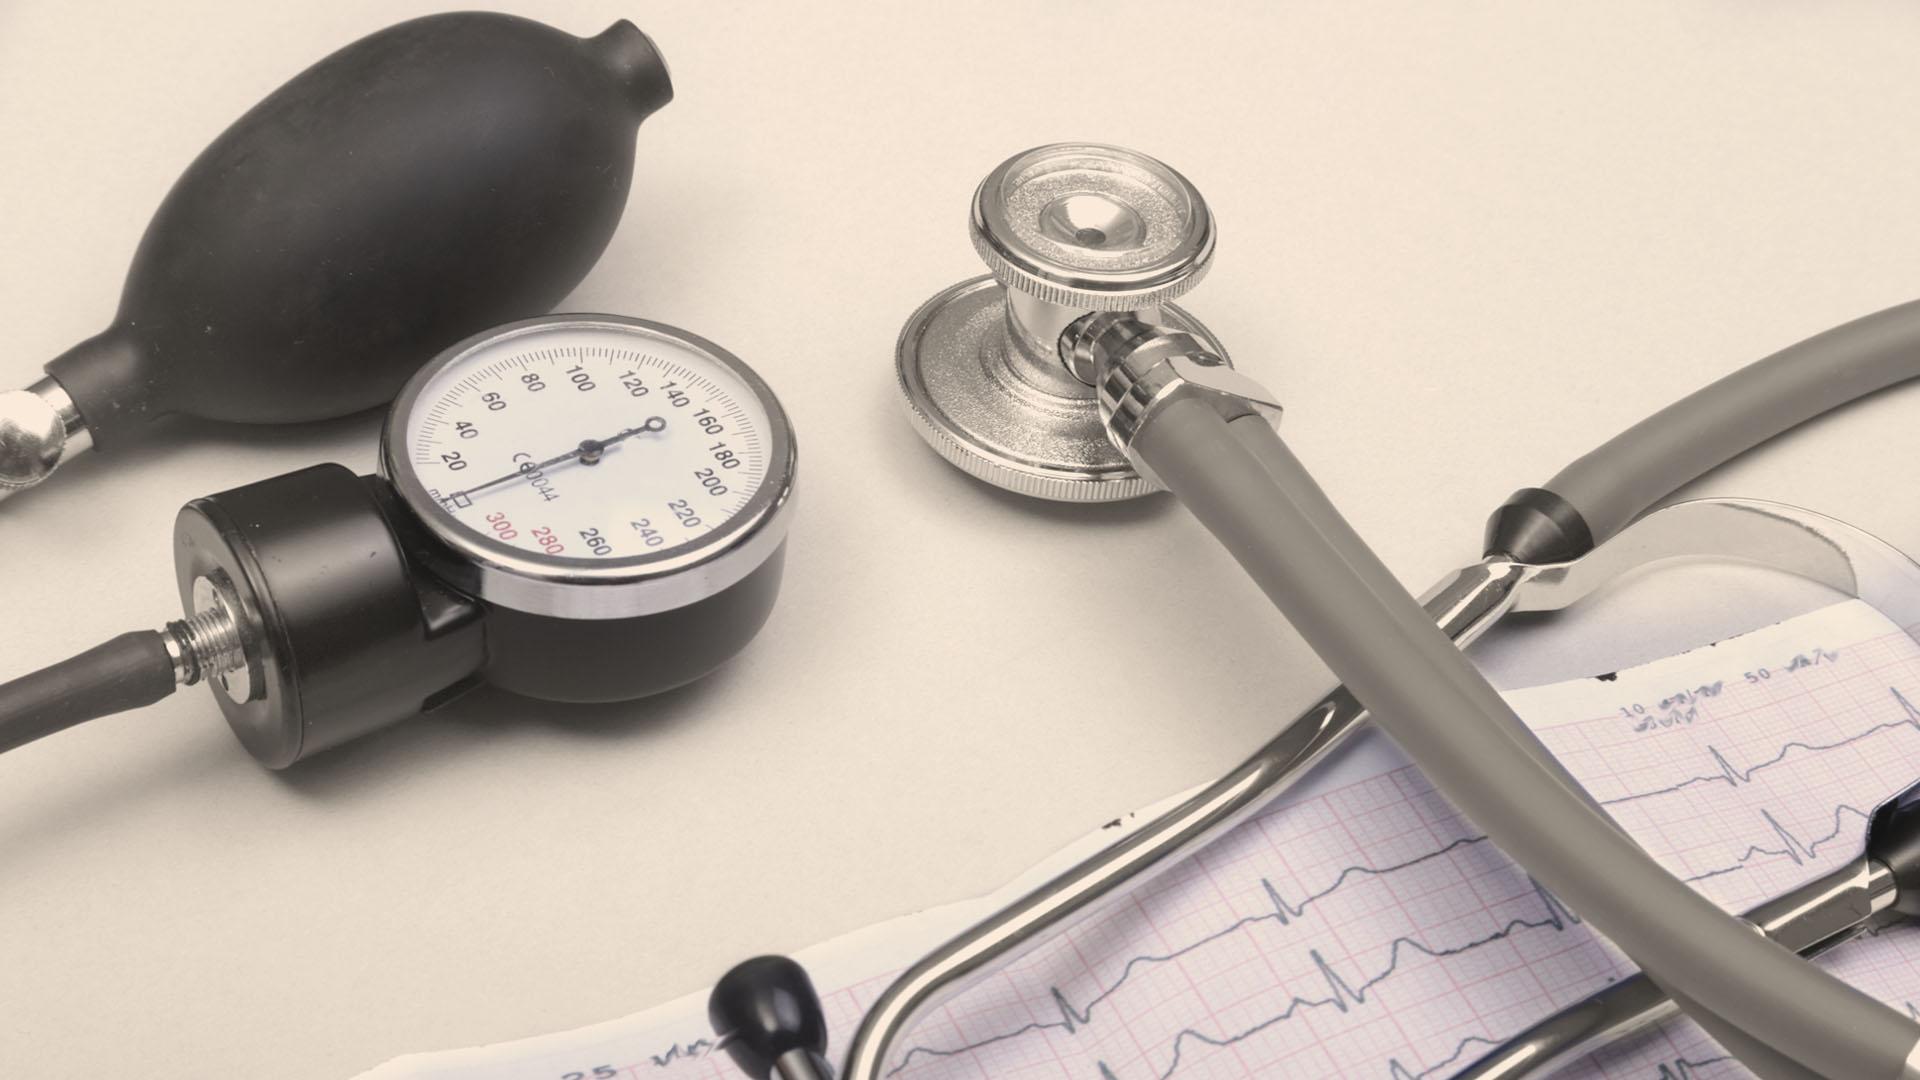 FG Cardio Vascular